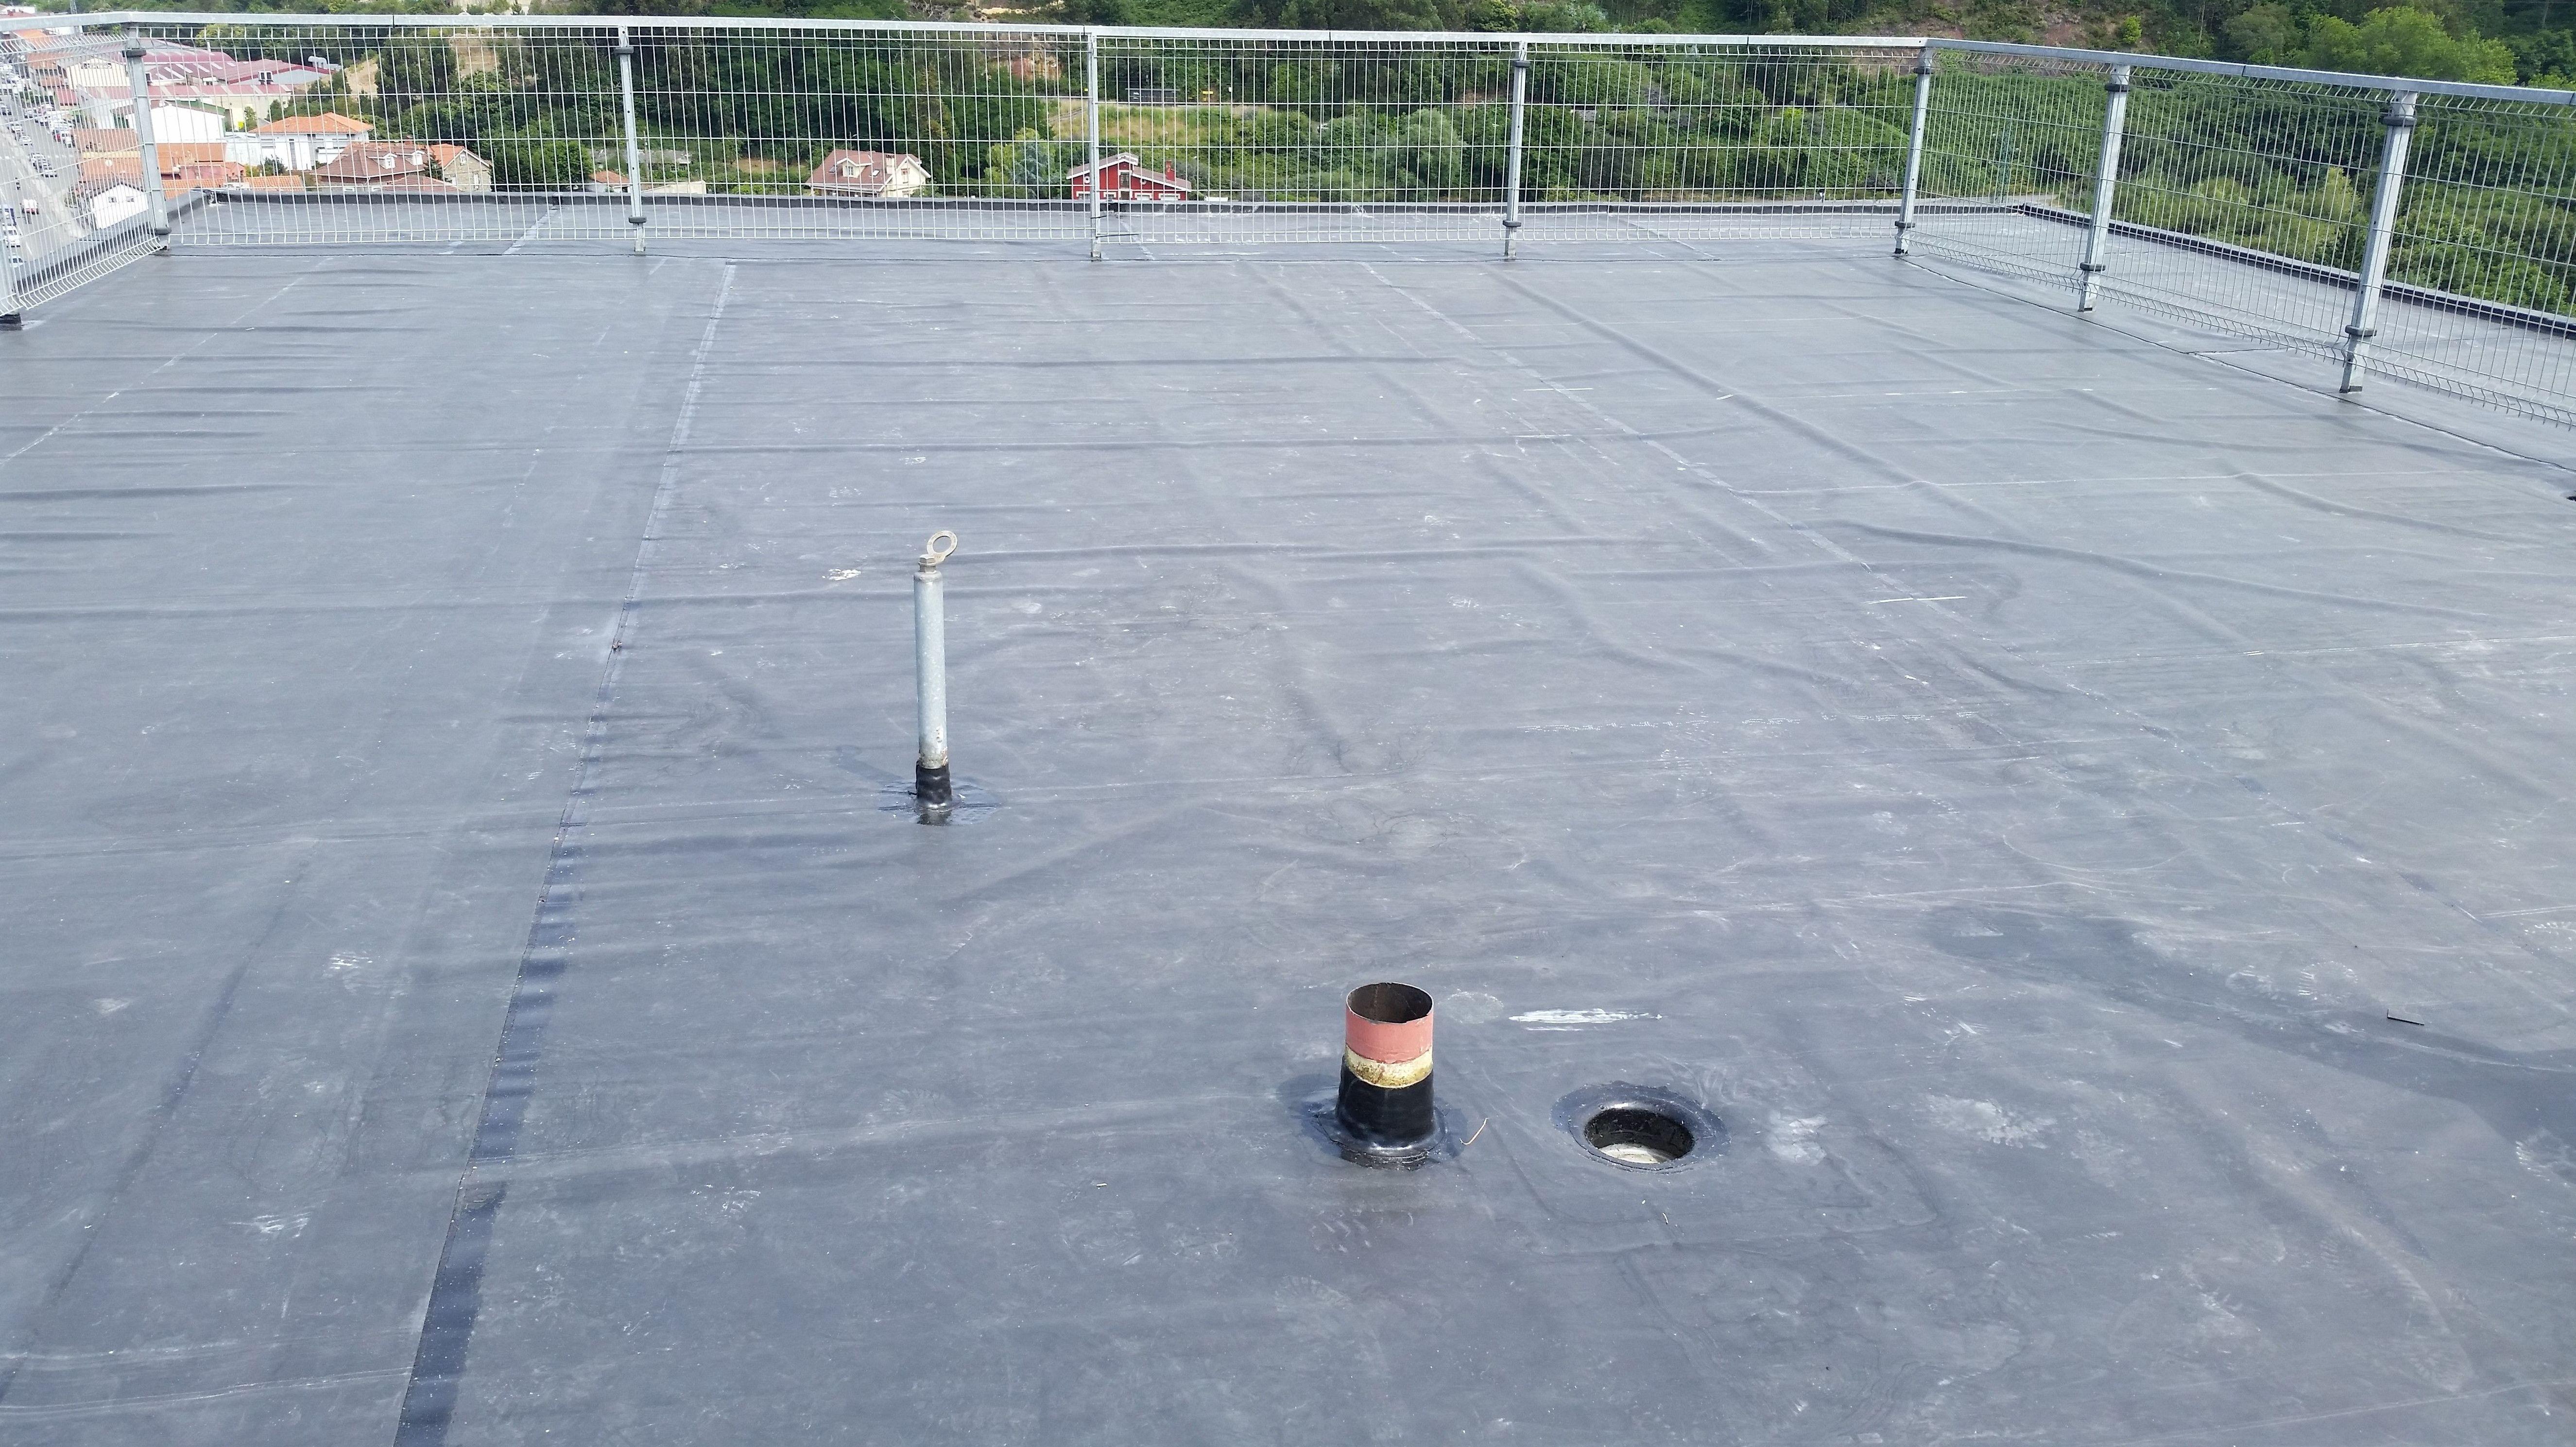 Impermeabilización de cubierta con lámina de caucho E.P.D.M.